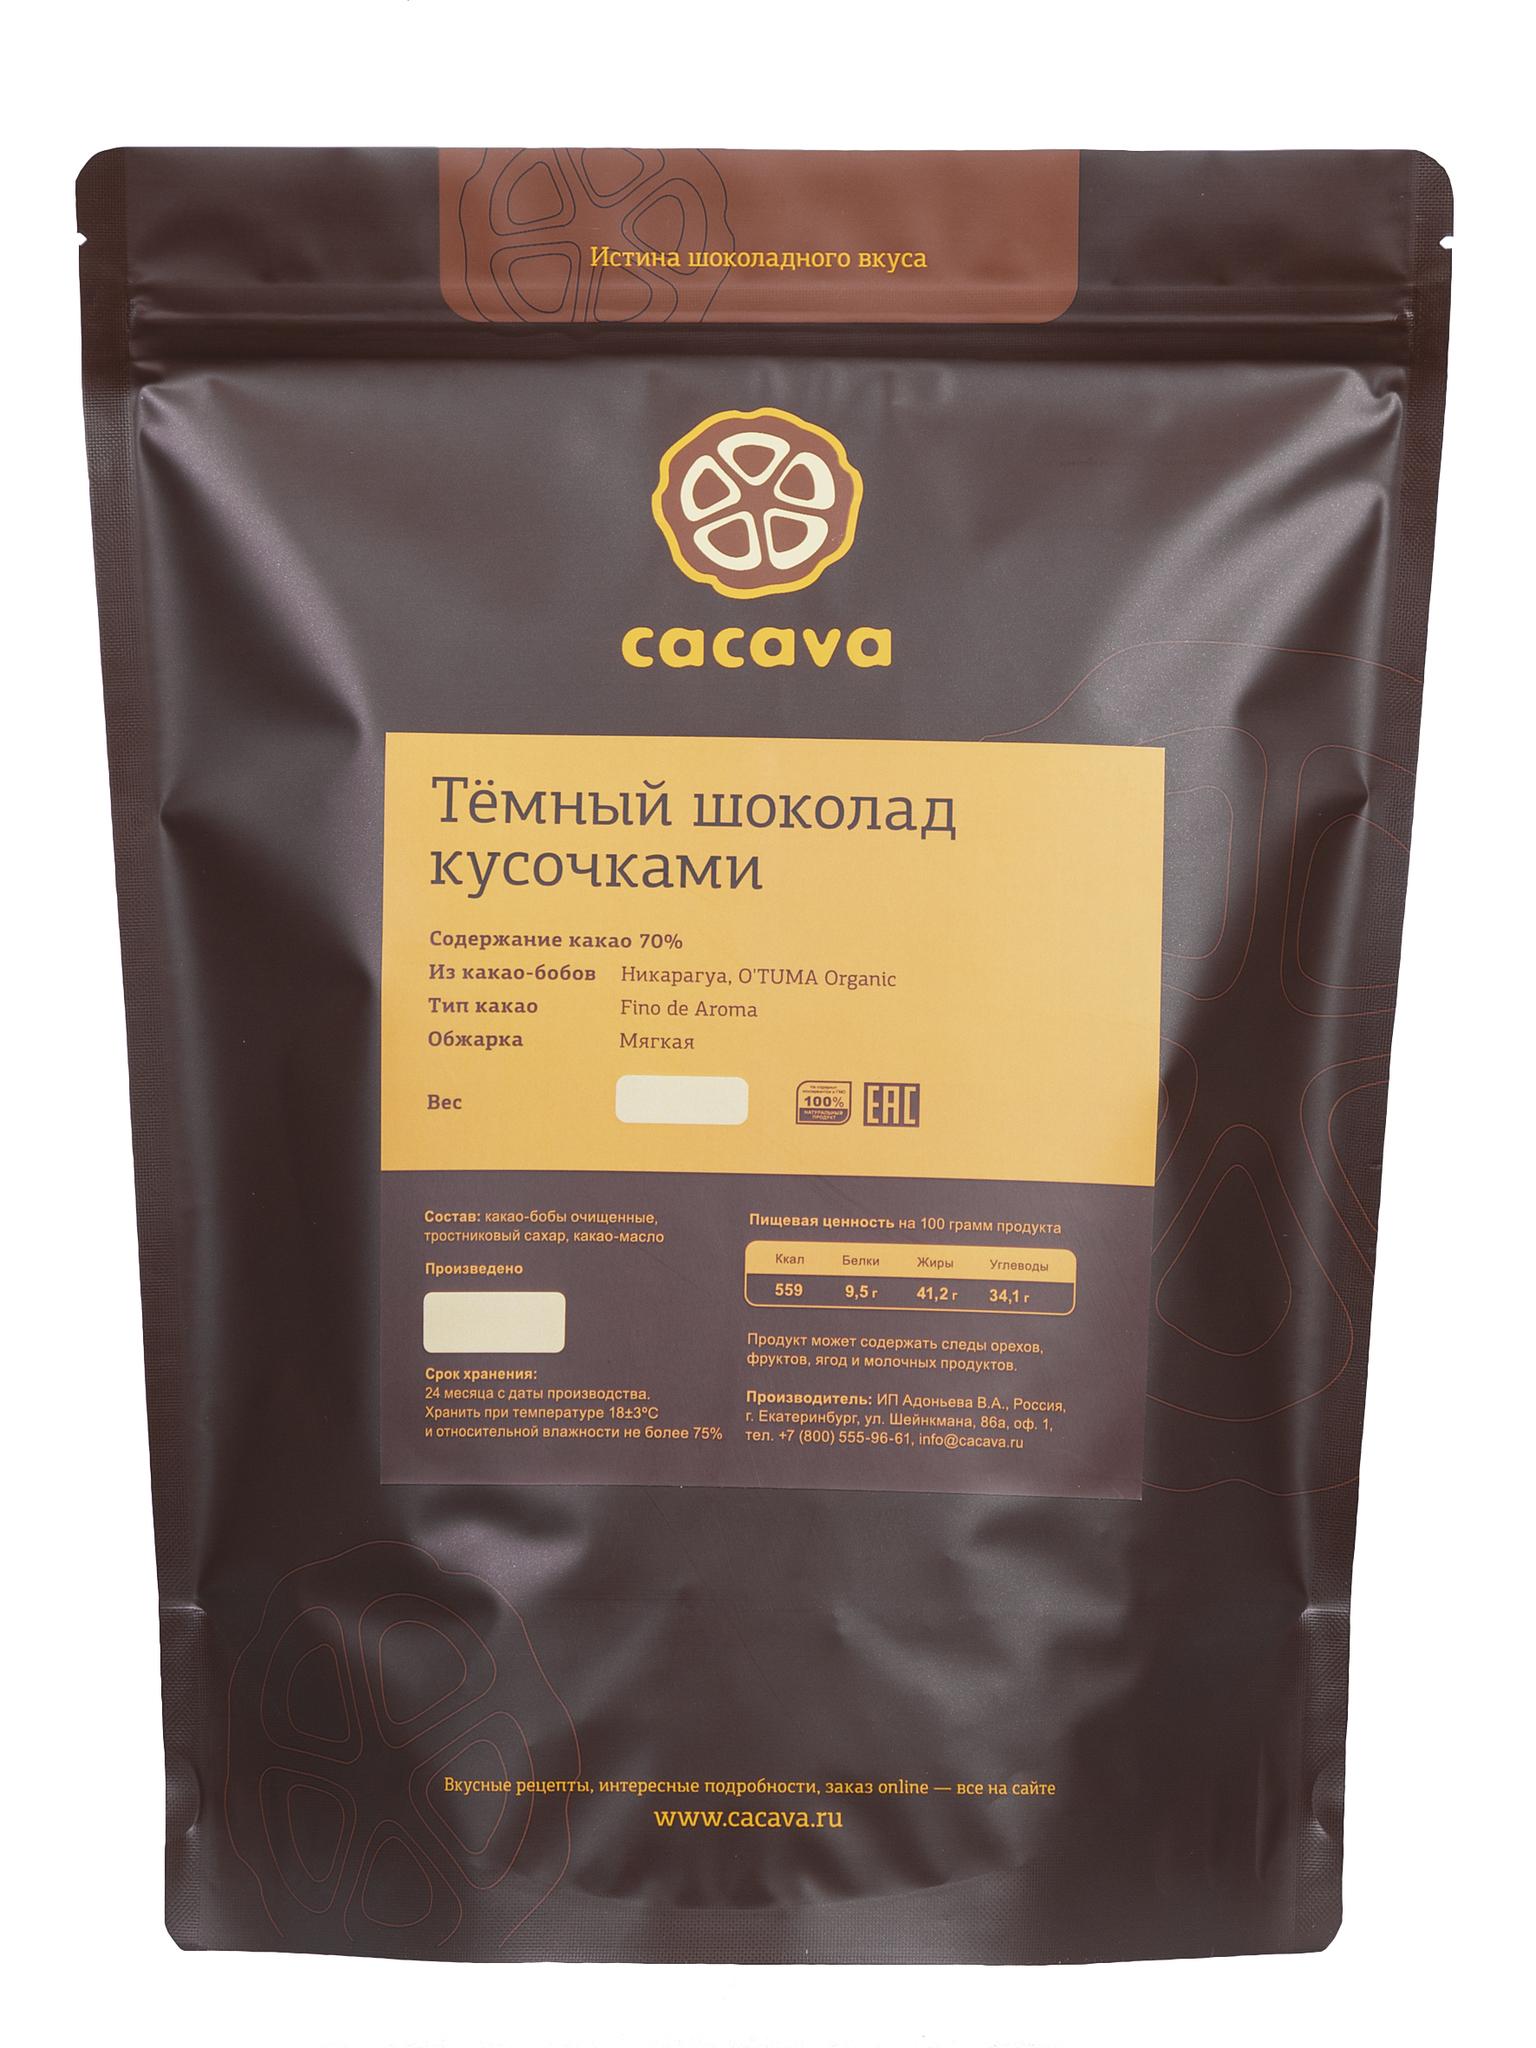 Тёмный шоколад 70 % какао (Никарагуа O'Tuma), упаковка 1 кг